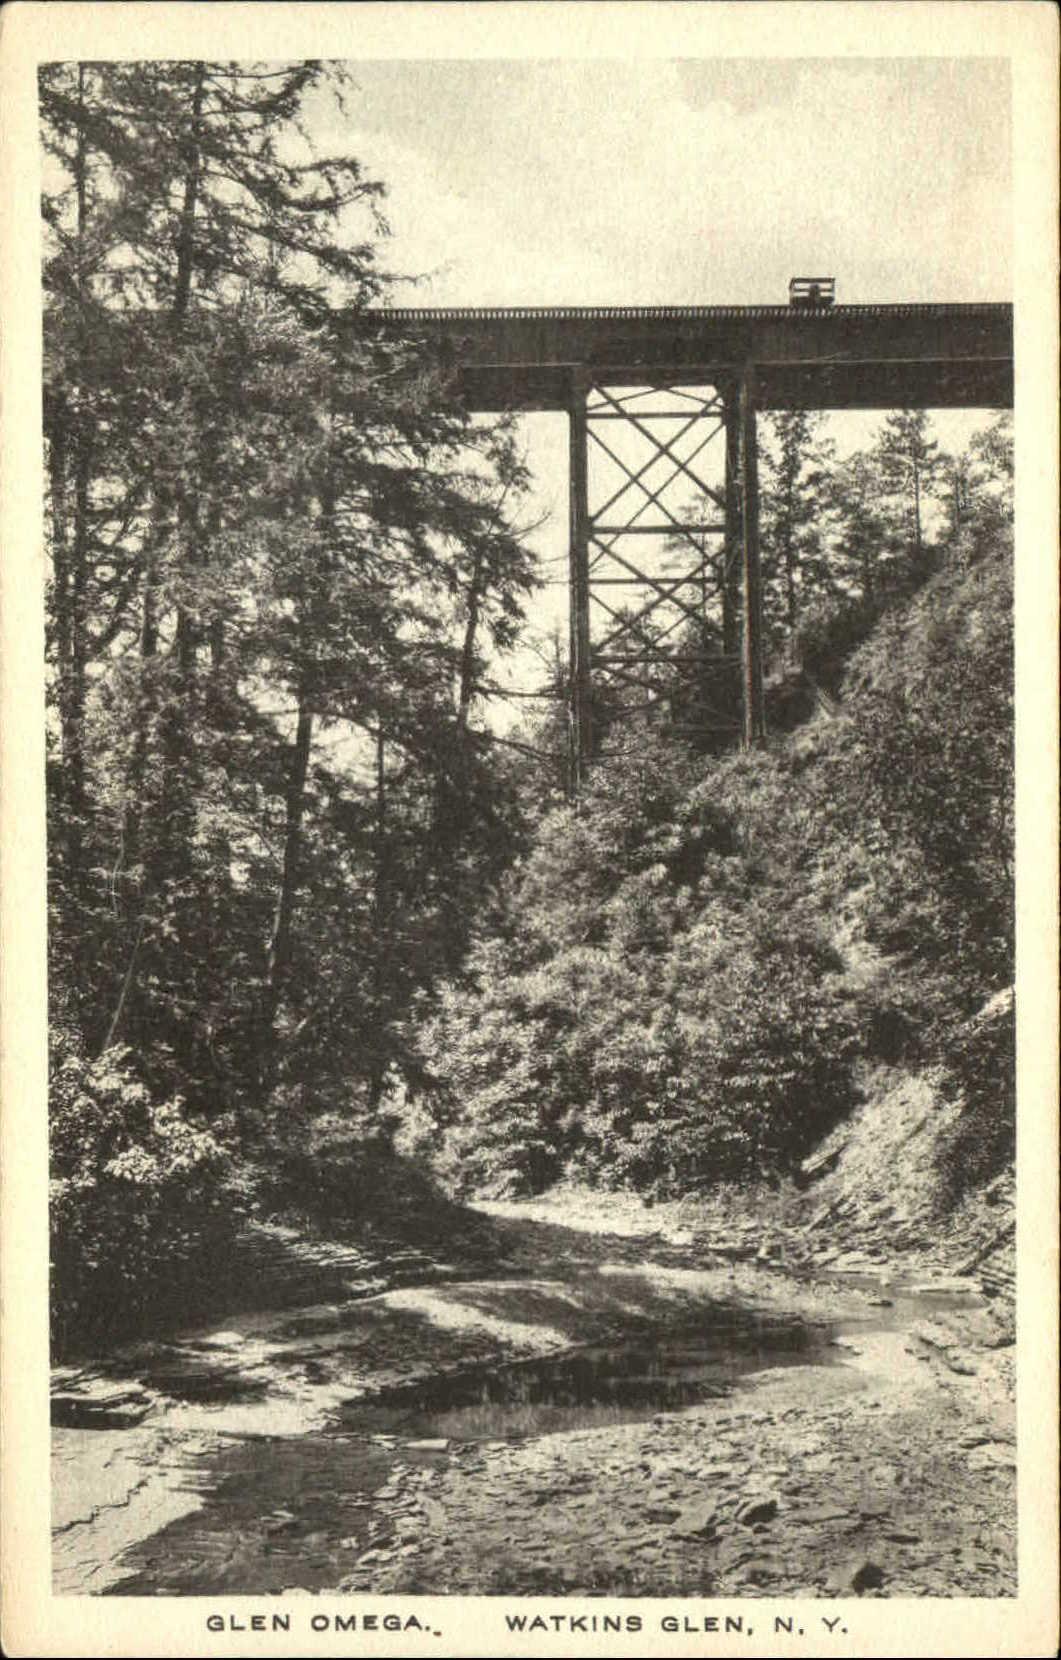 Glen-Omega-bridge-Watkins-Glen-New-York-NY-Albertype-1920s